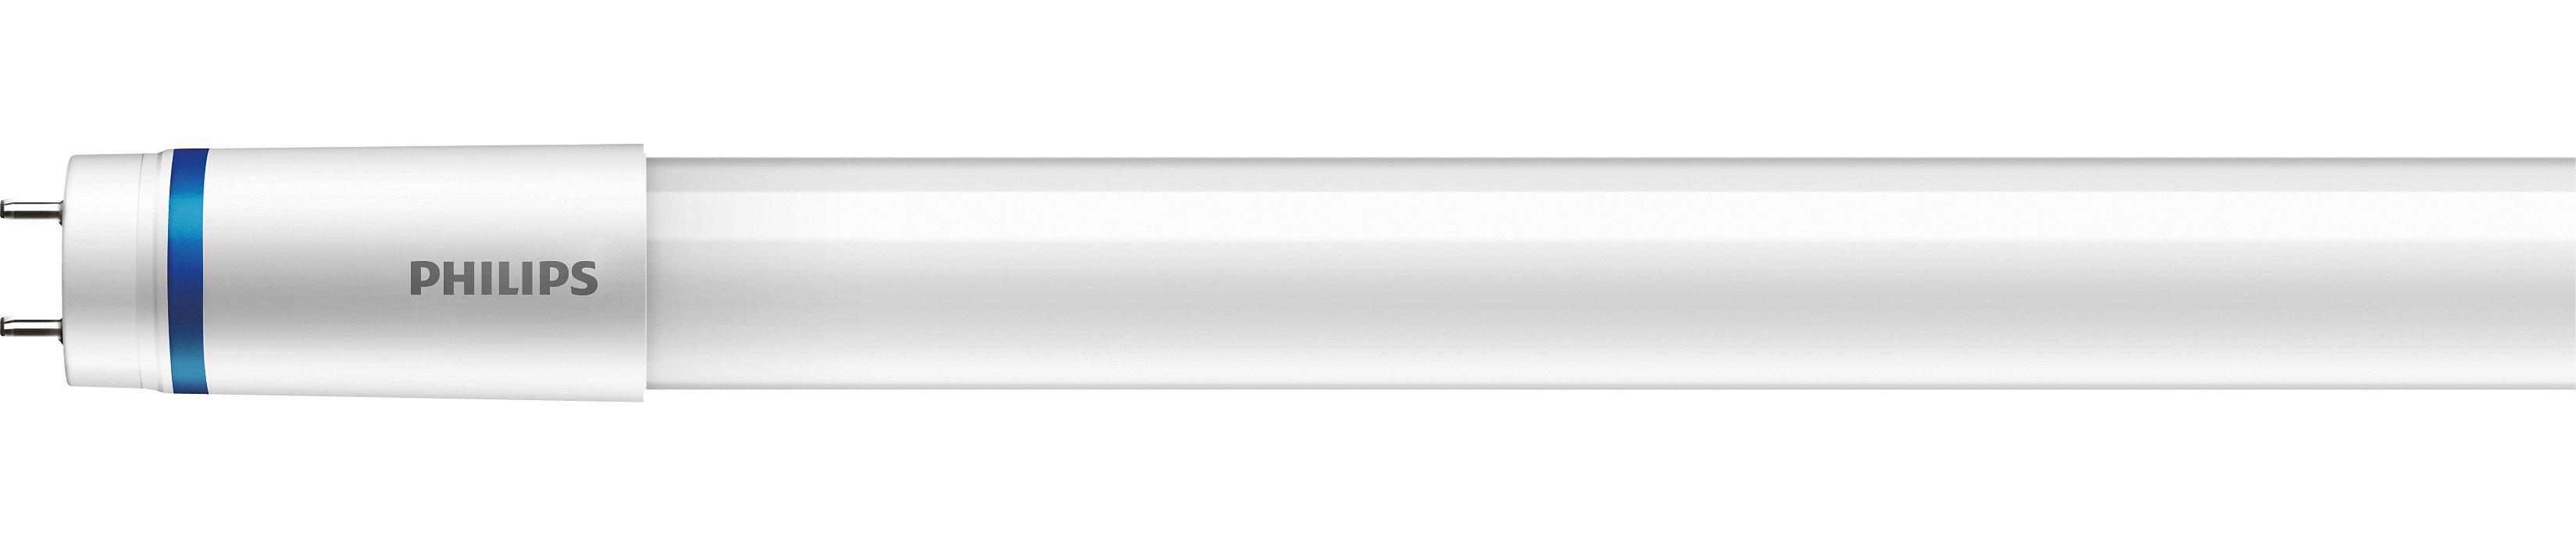 SIGNIFY ARGENTINA S.A. Tubo Ecofit Mains LEDtube 600mm 8W 765 G Philips